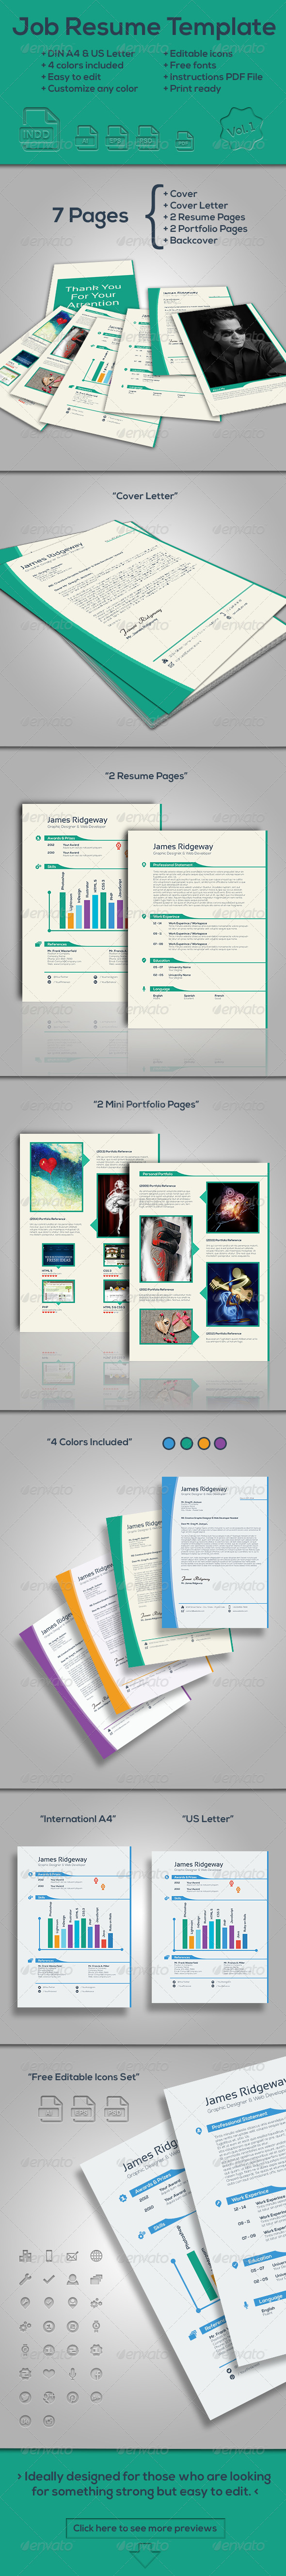 GraphicRiver Job Resume Template Vol.1 7480854